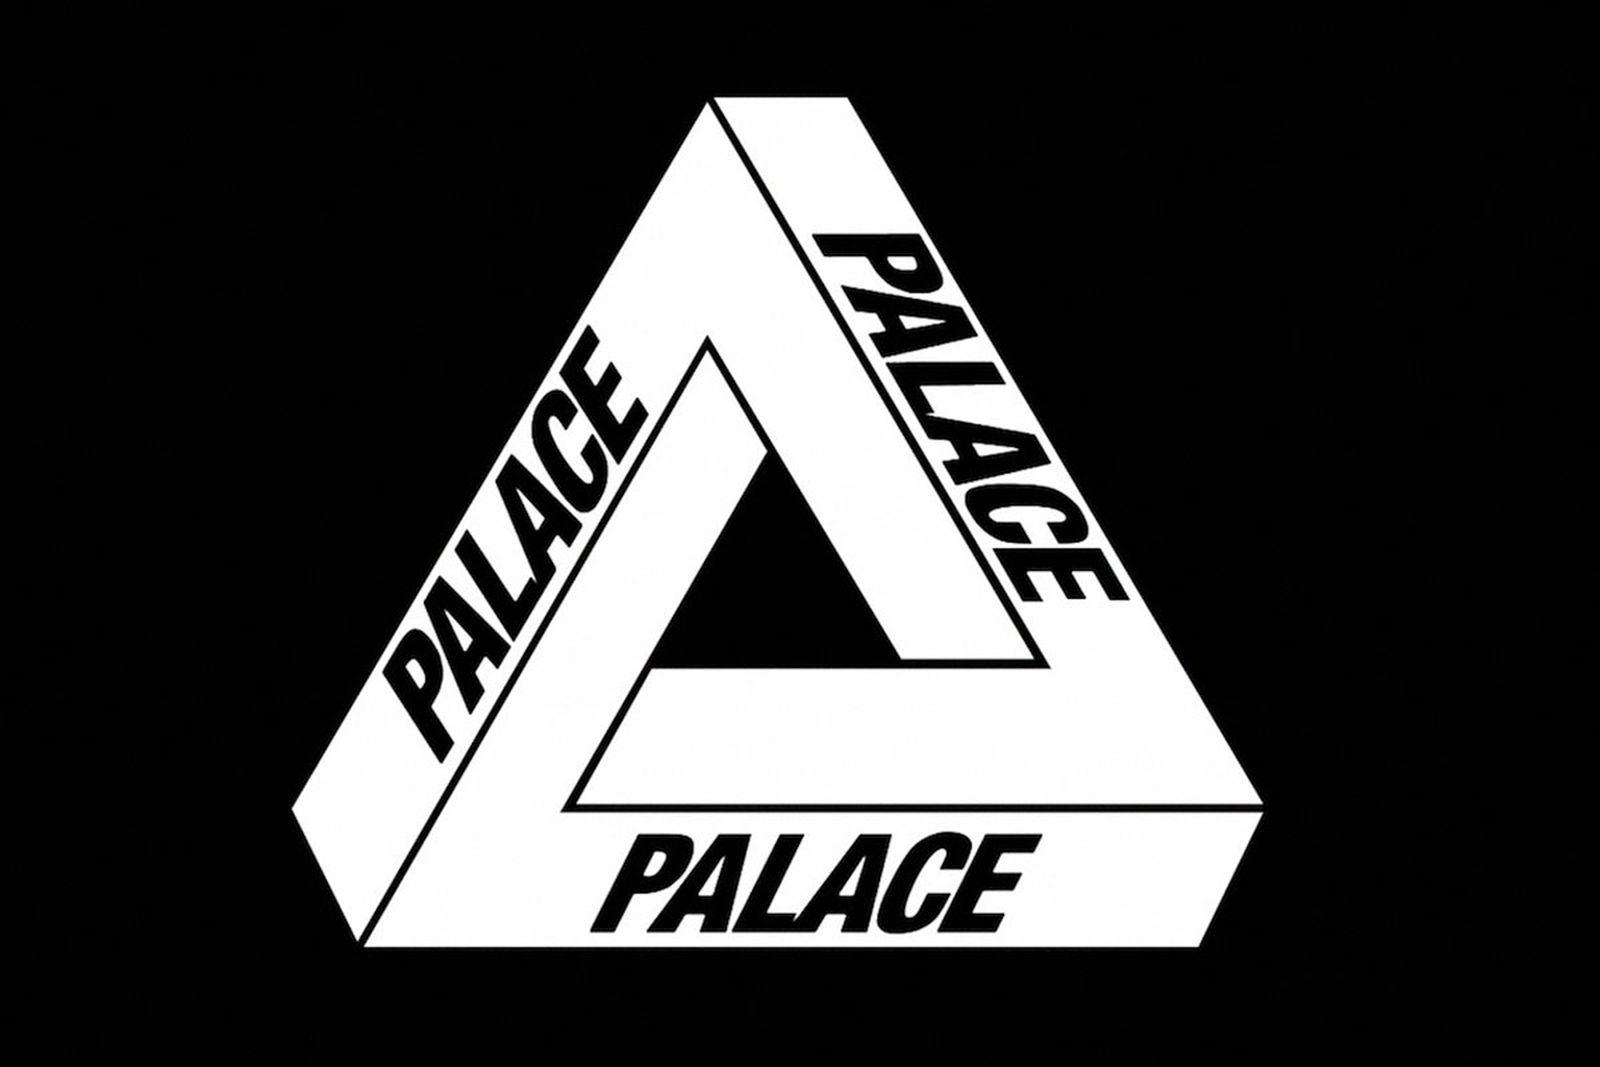 palace-skateboards-guide-2